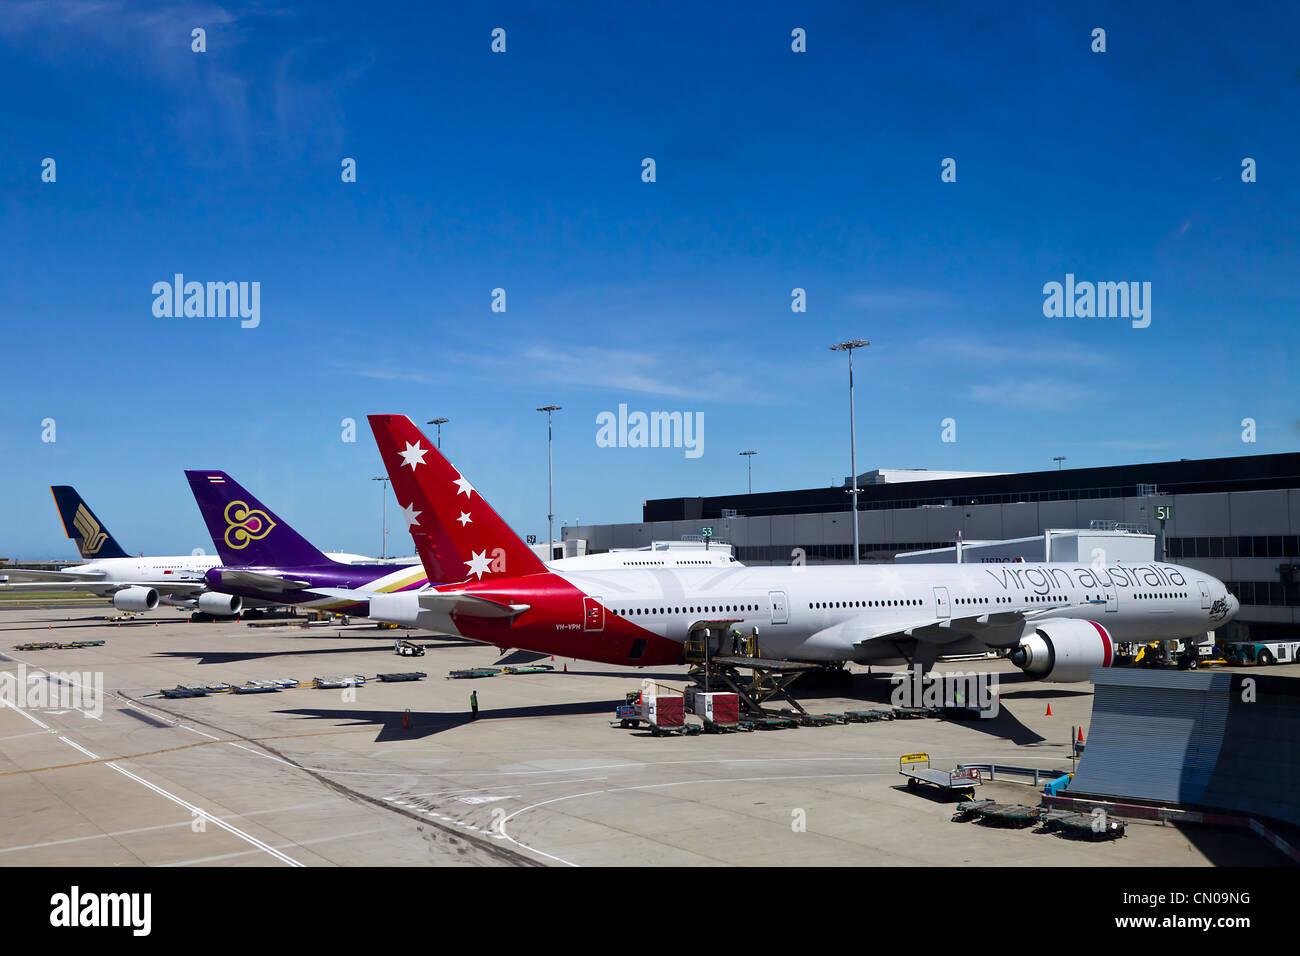 Blue apron australia - Singapore Airline Thai Airways Virgin Australia Sydney Australia Stock Photo